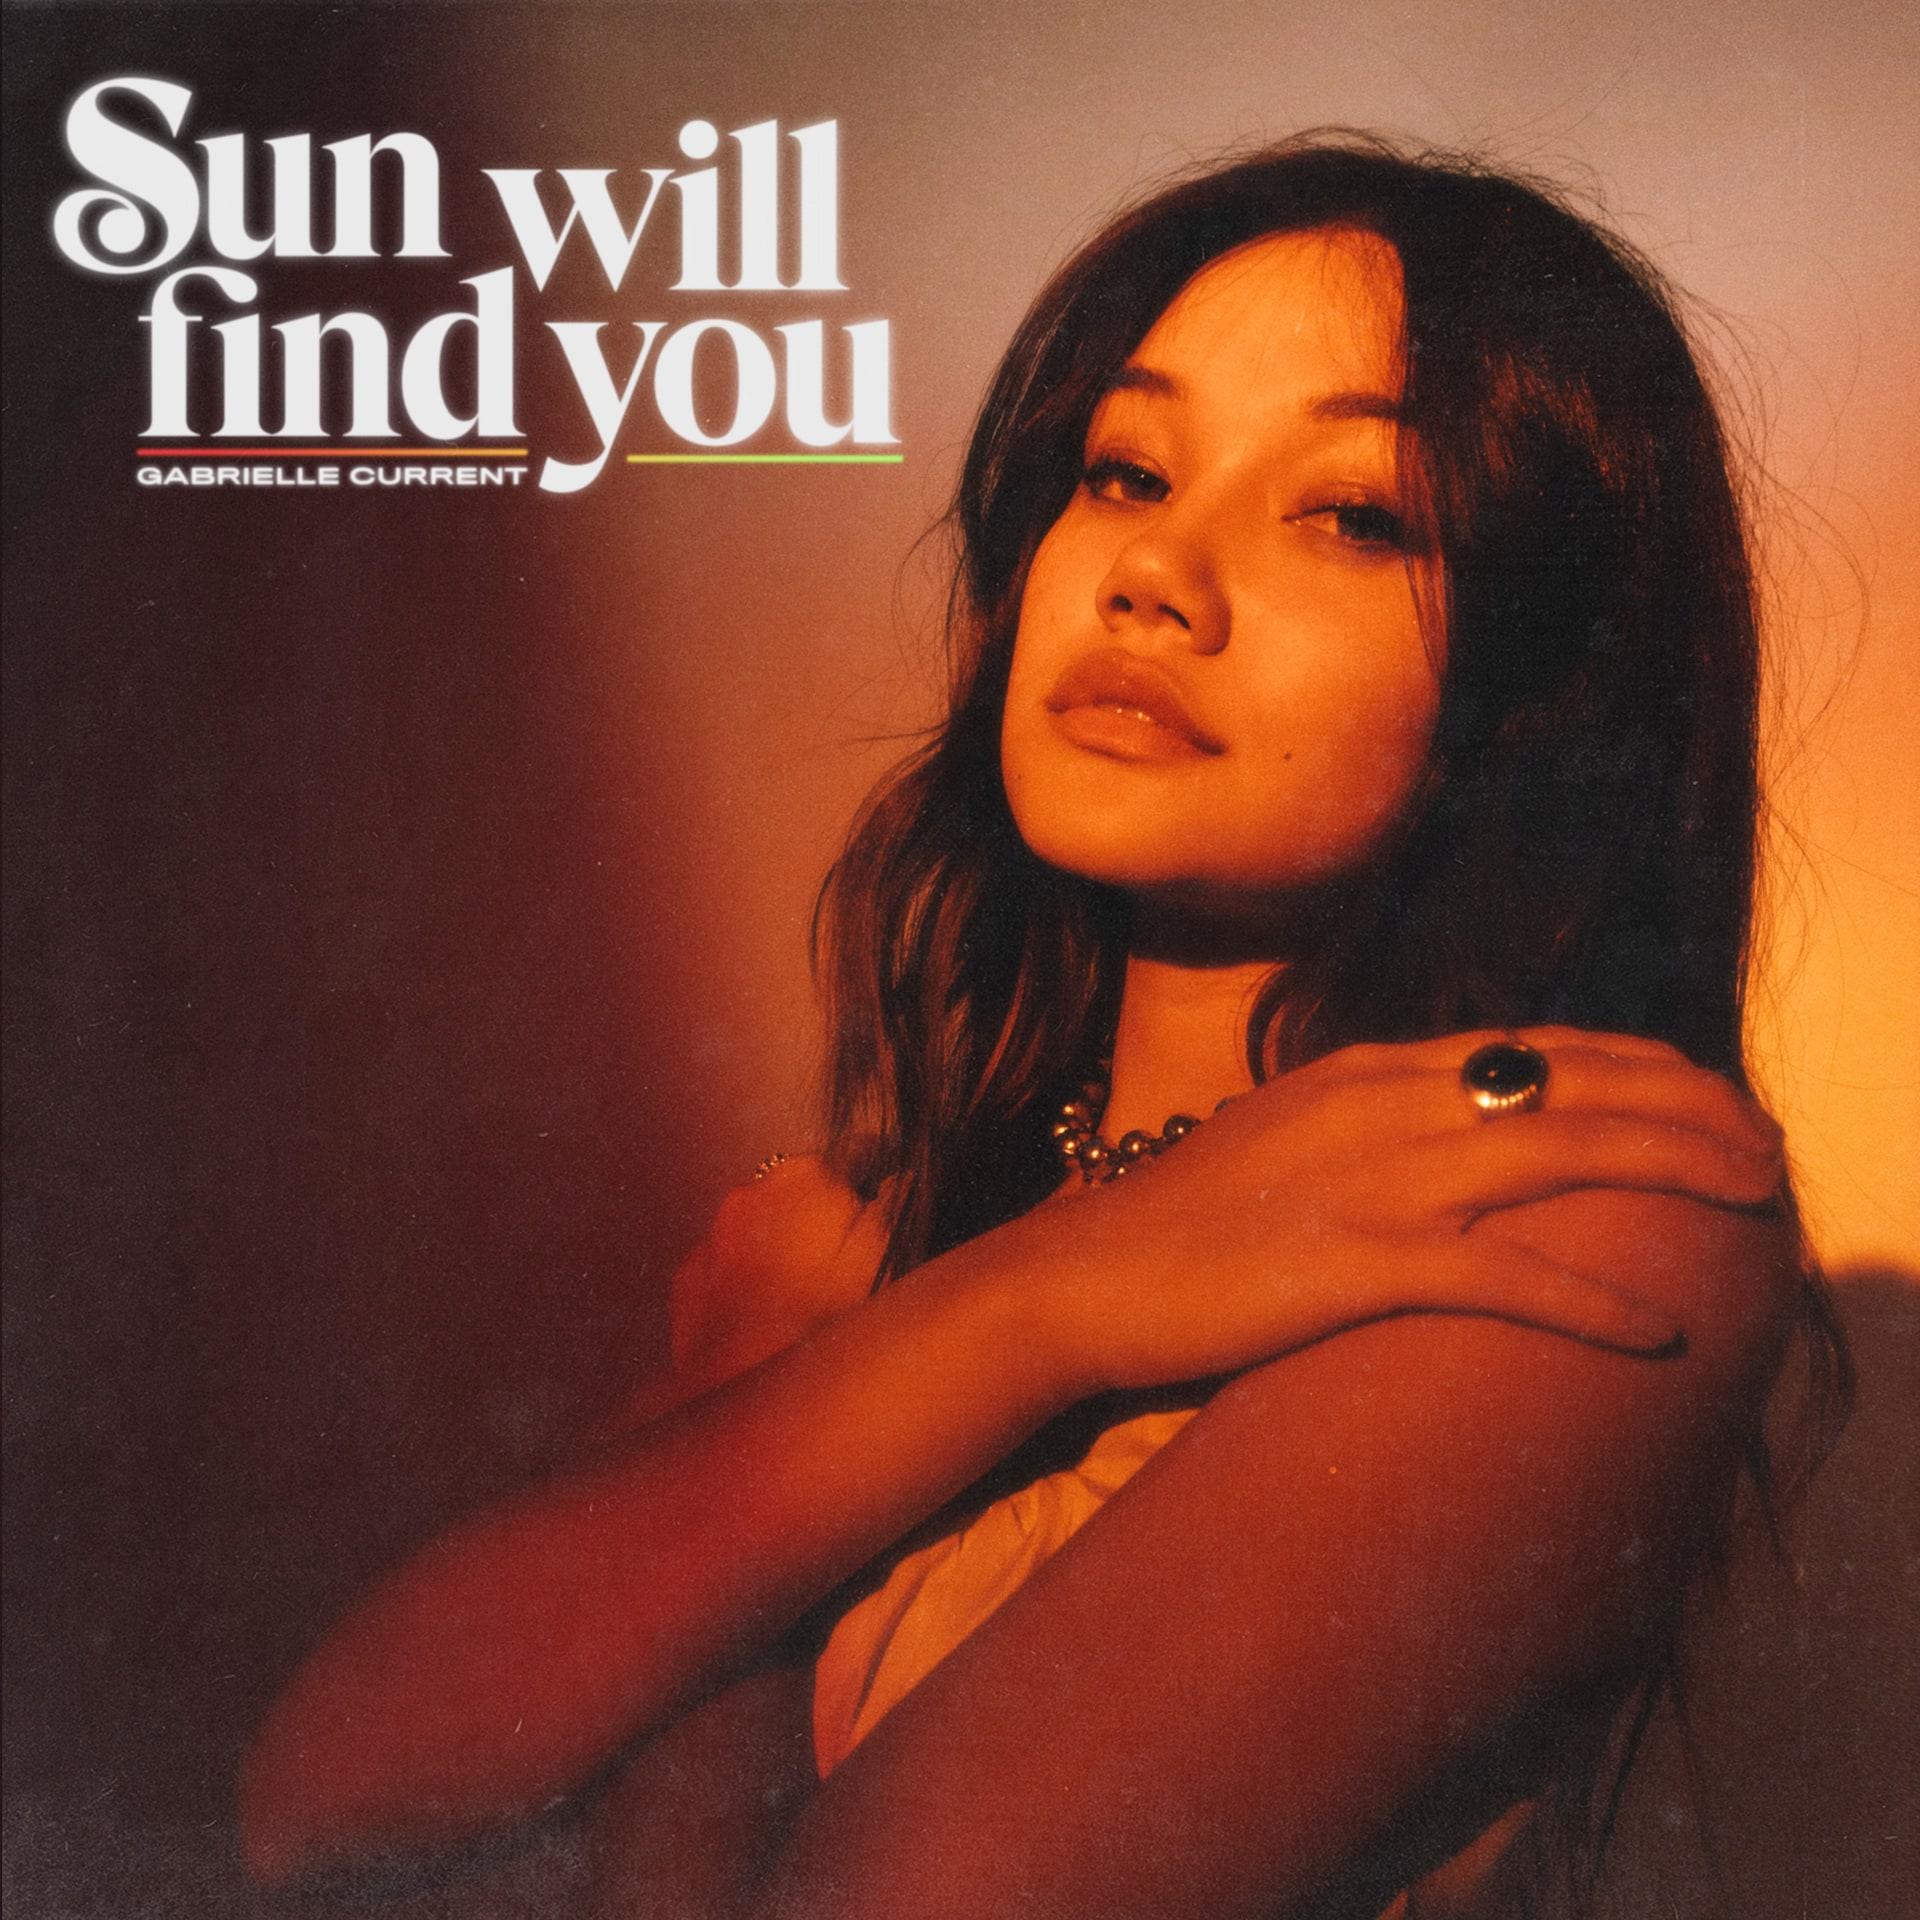 gabrielle-current_sun-will-find-you21